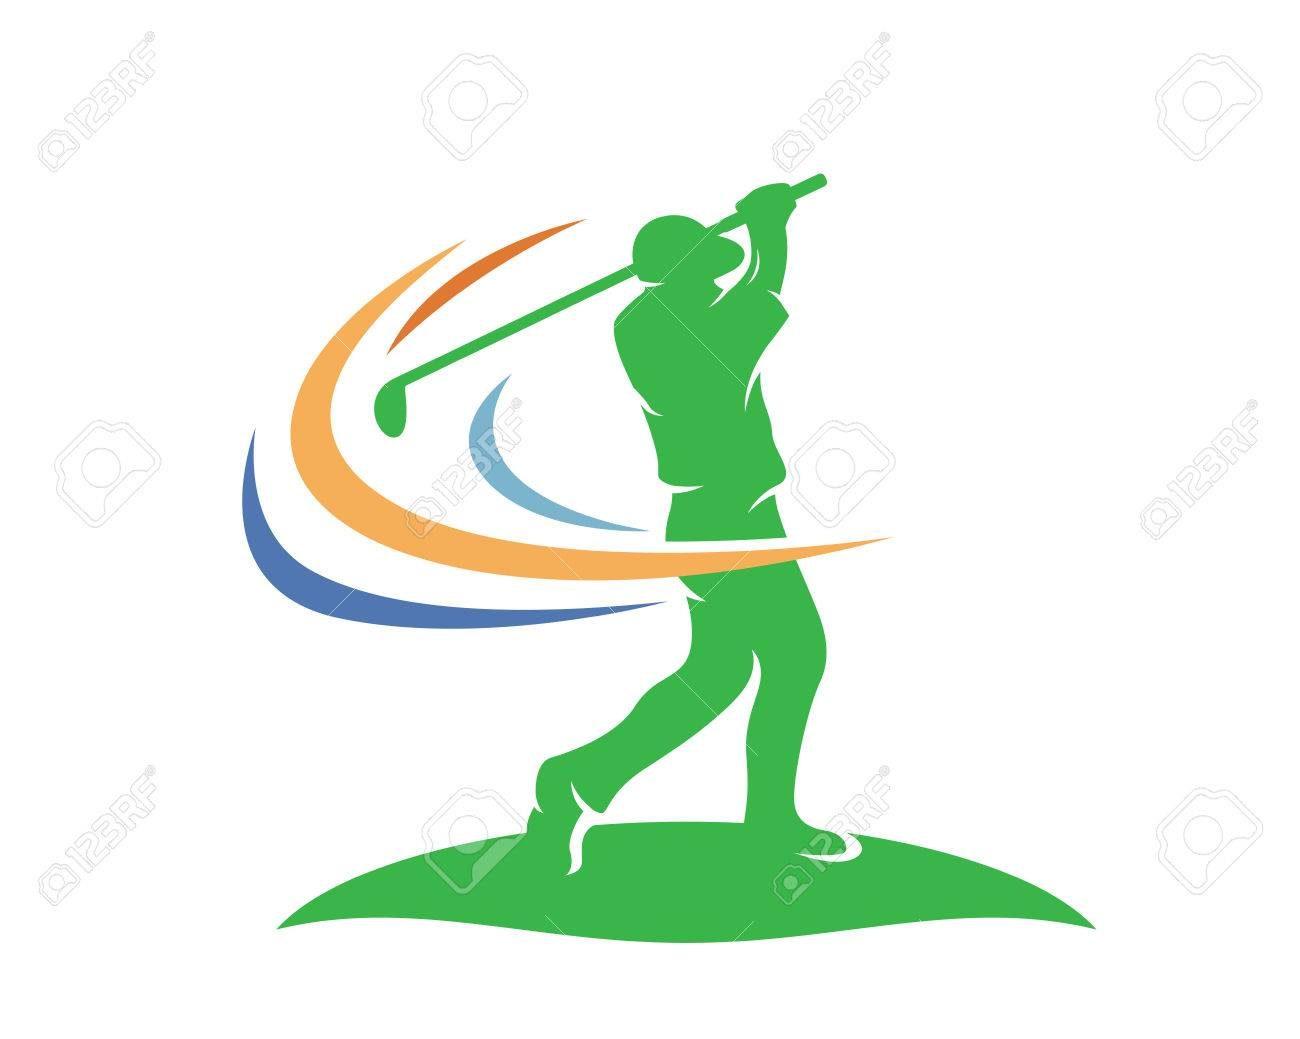 79341595-modern-golf-logo-professional-golfer-athlete-winning-swing.jpg